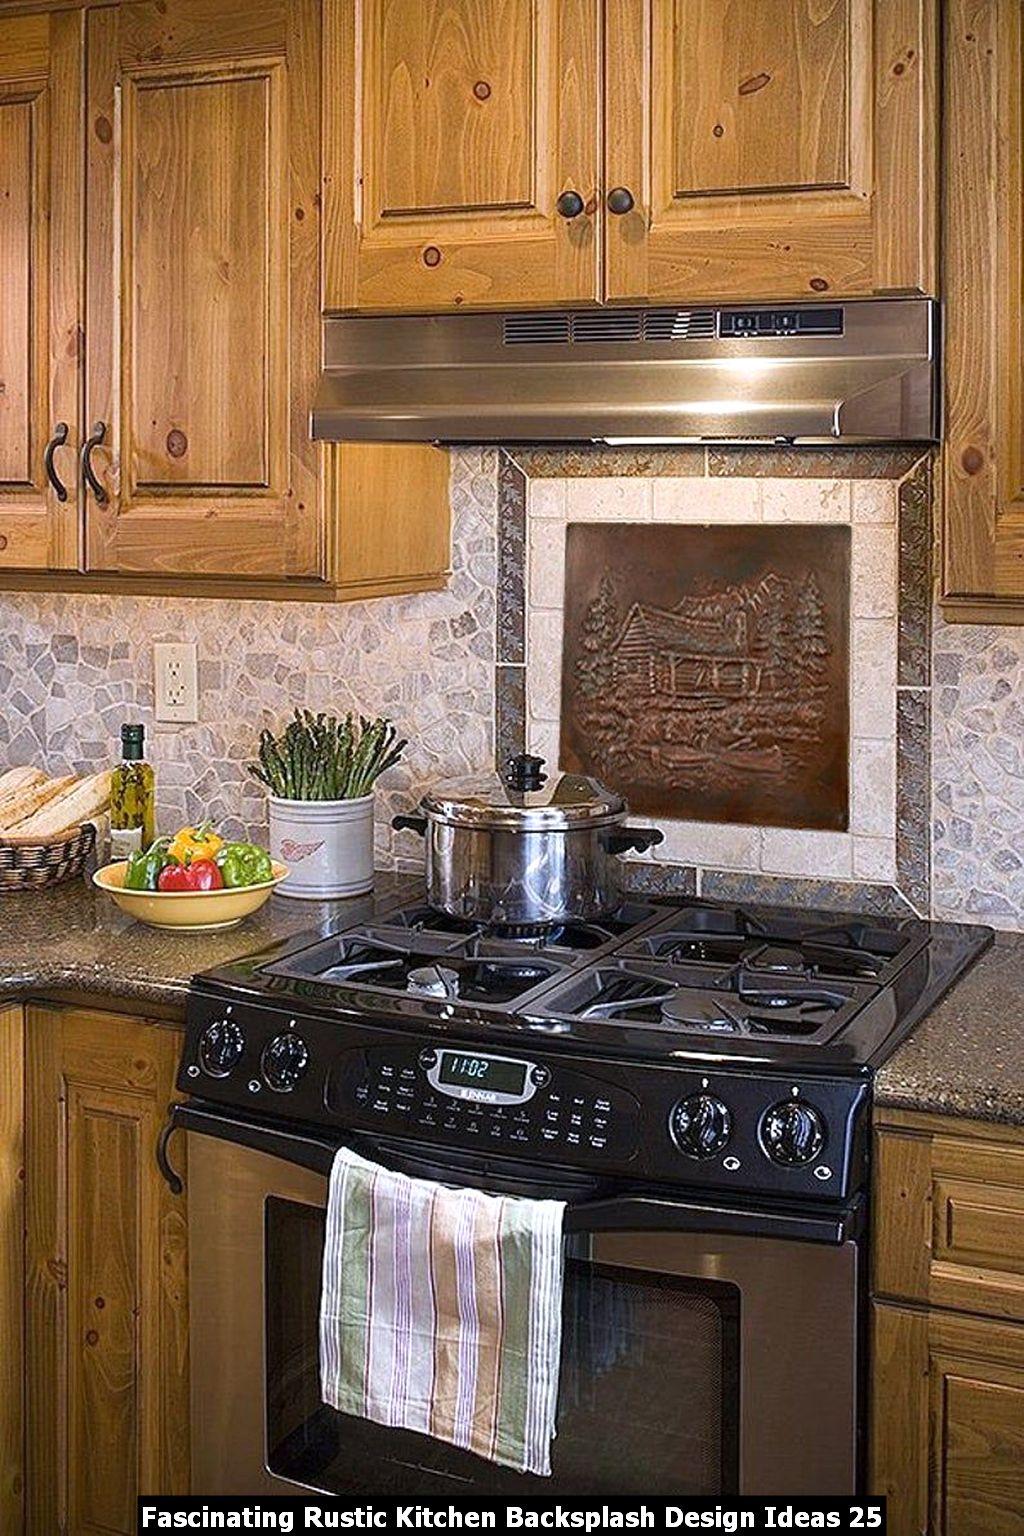 Fascinating Rustic Kitchen Backsplash Design Ideas 25